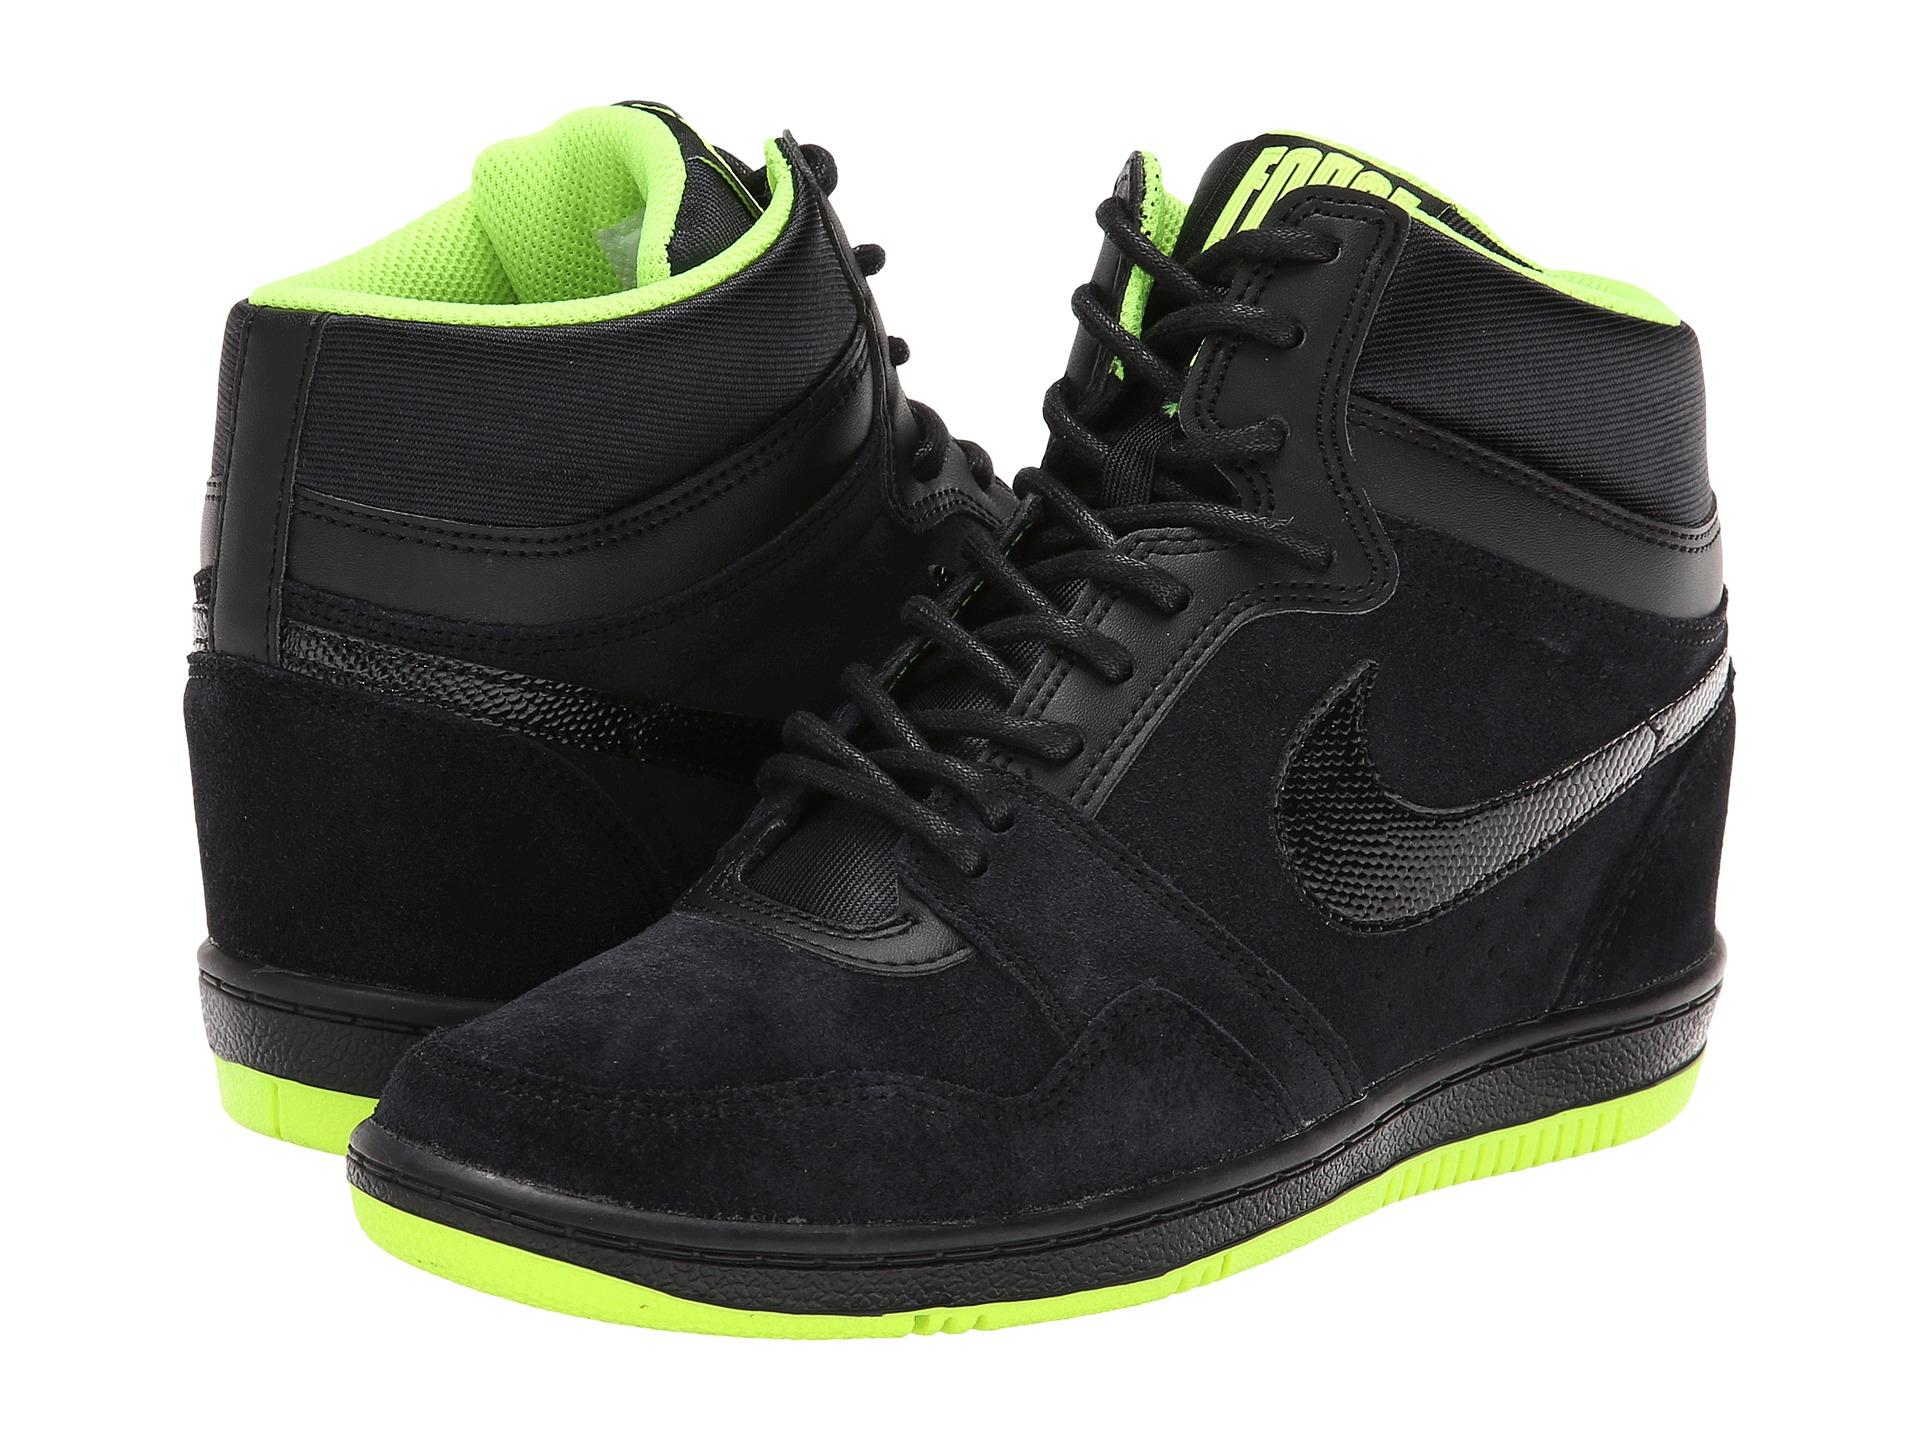 Blue Sandals: Zappos Nike Sneakers Women Nike Fast Love Sky High Wedge Sneakers